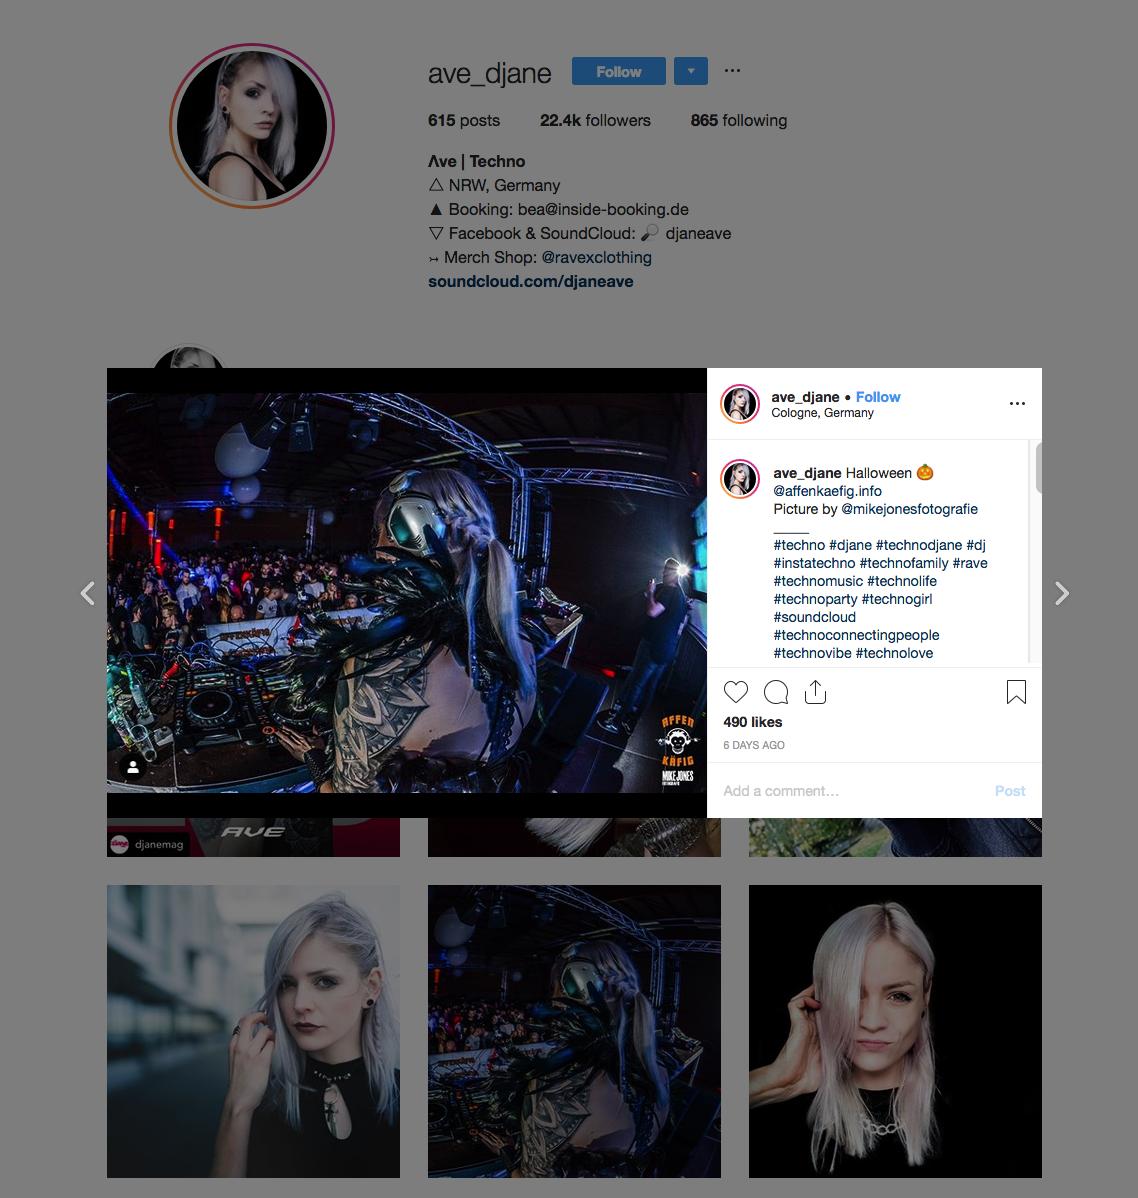 Ave - Instagram Techno Influencer